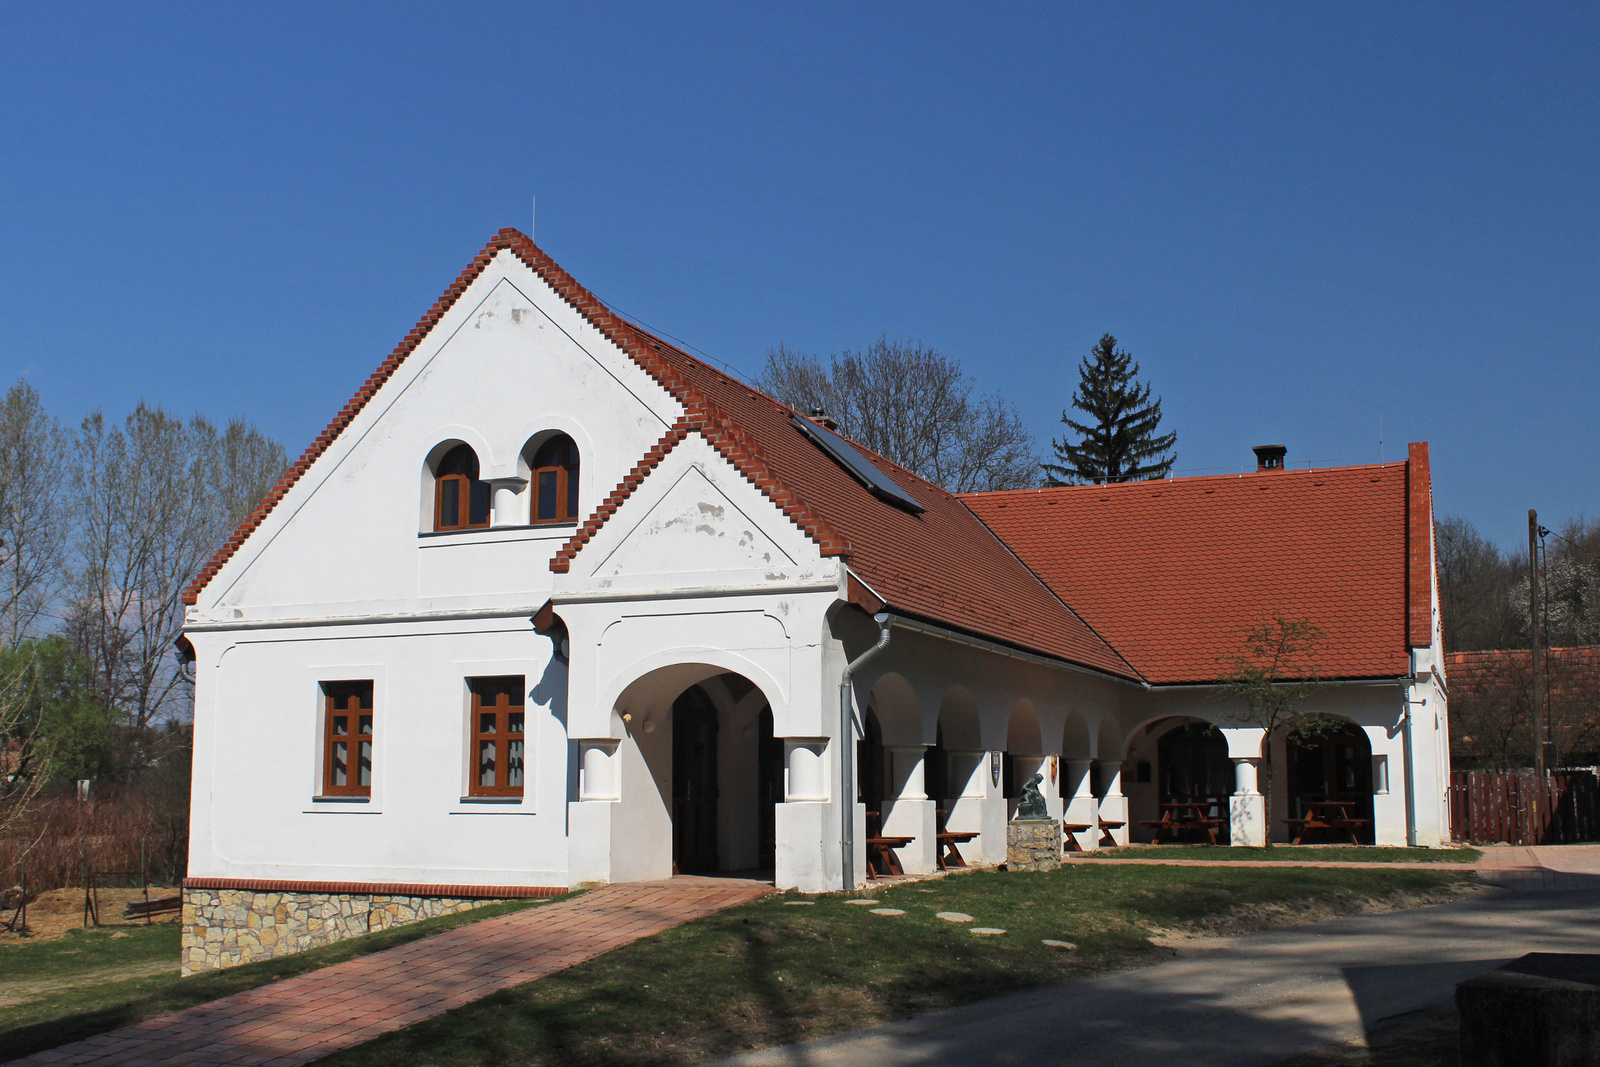 20170402-82-Varoslod-IglauerPark